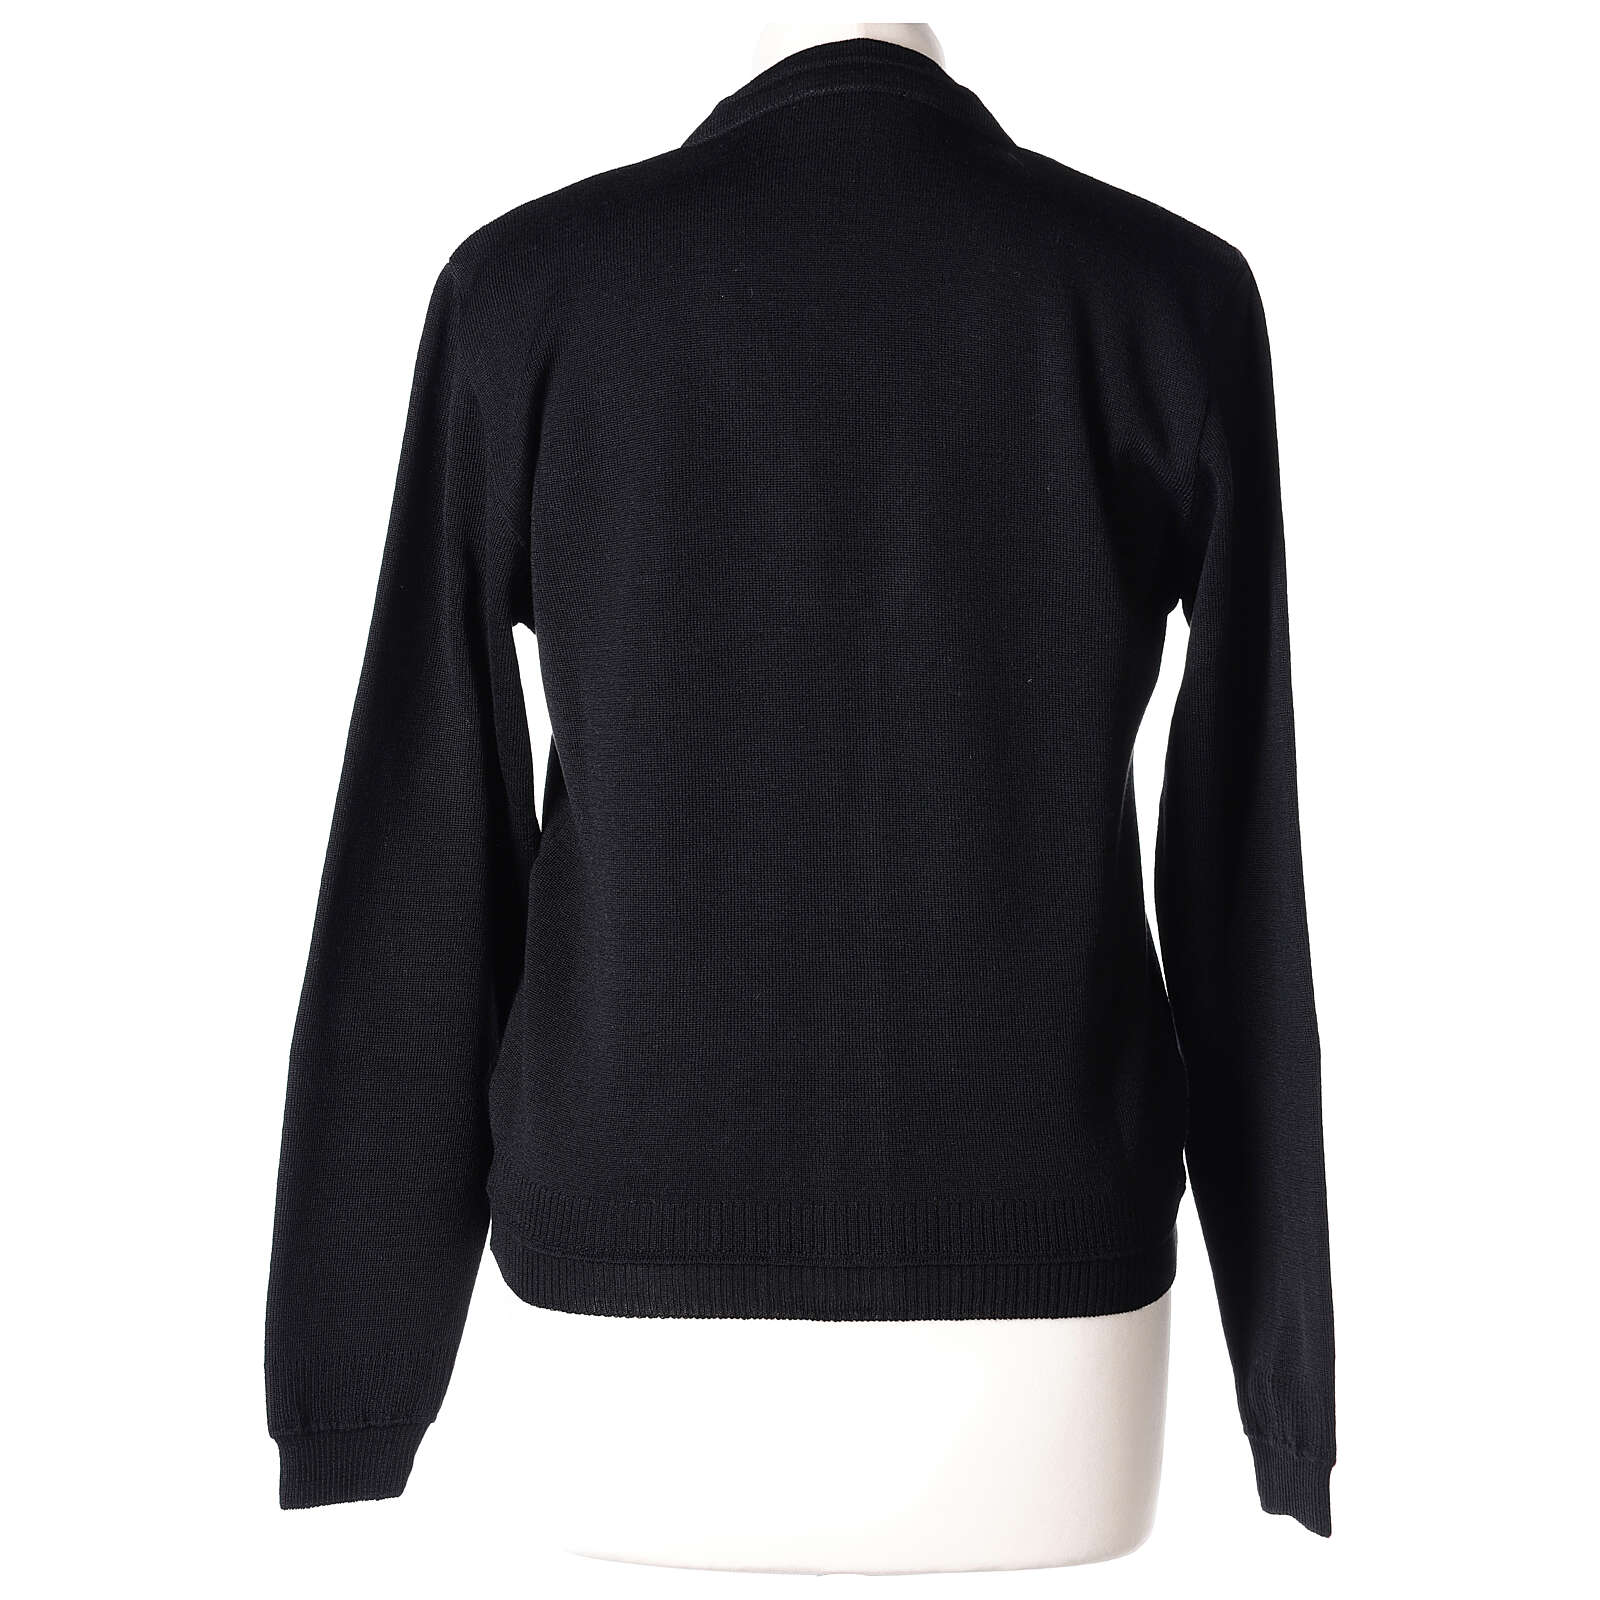 Chaqueta corta negra 50% lana merina 50% acrílico monja In Primis 4